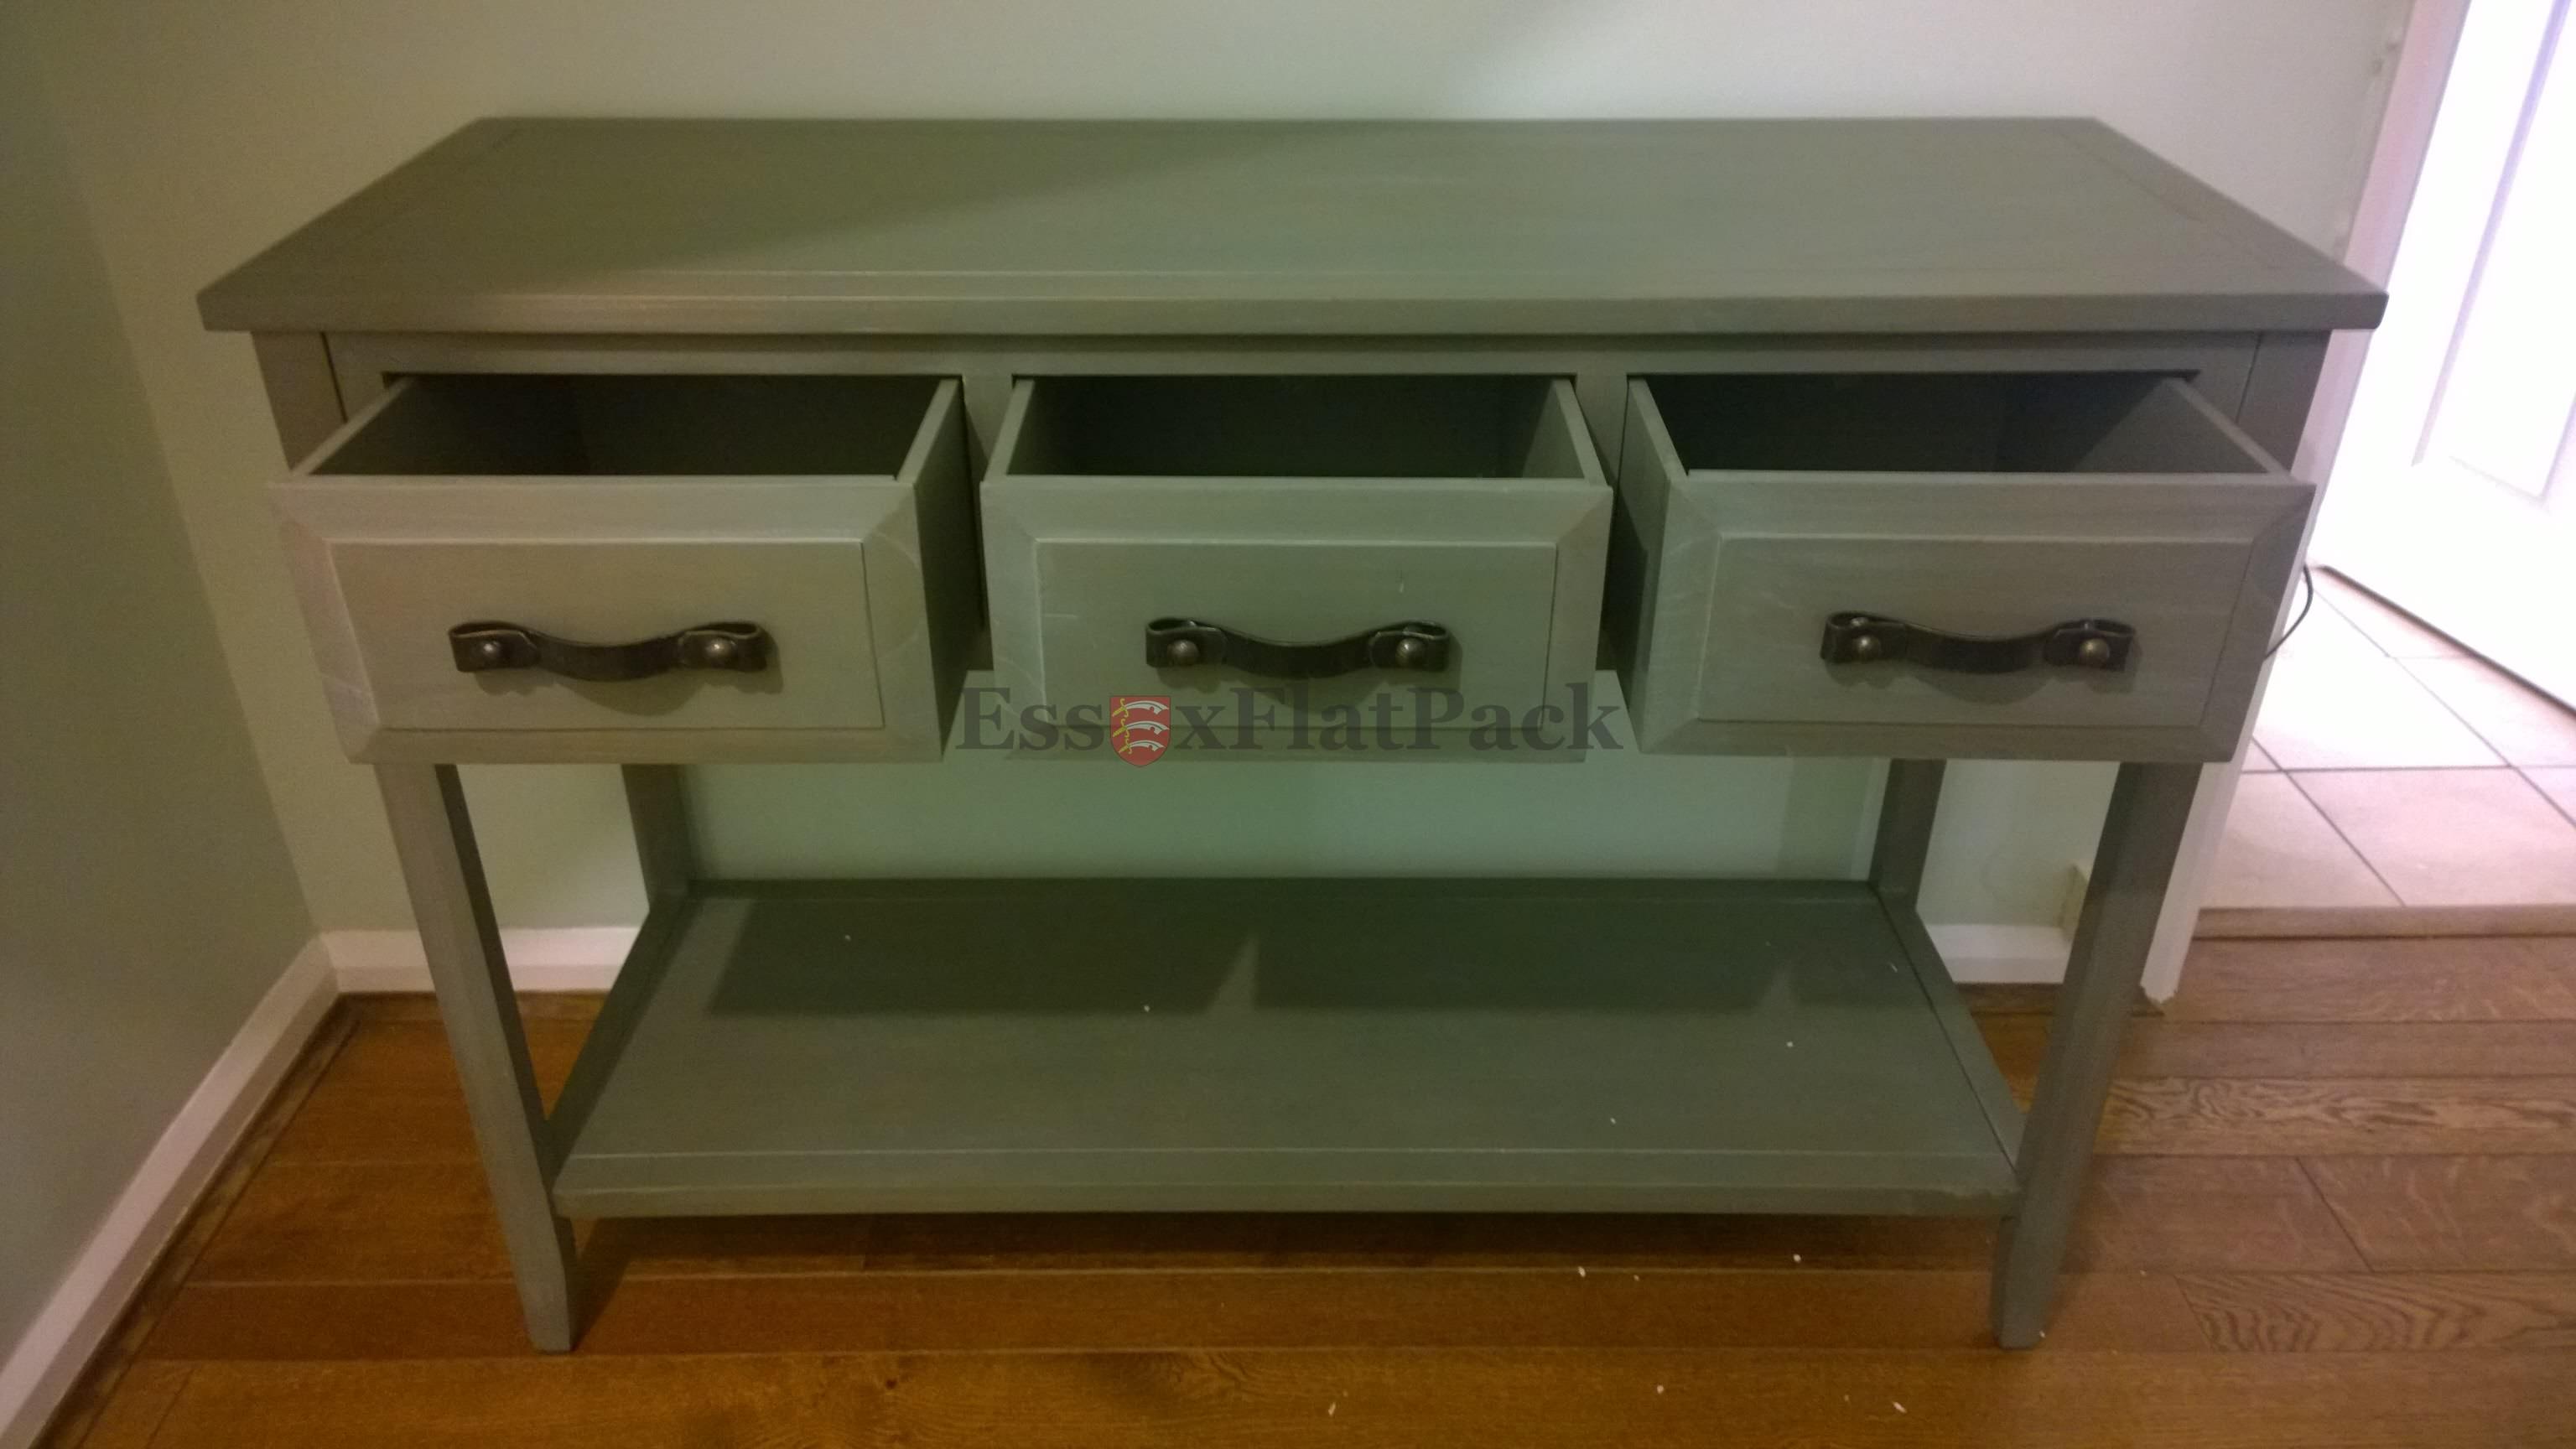 essexflatpack-furniture-20141230162806.jpg